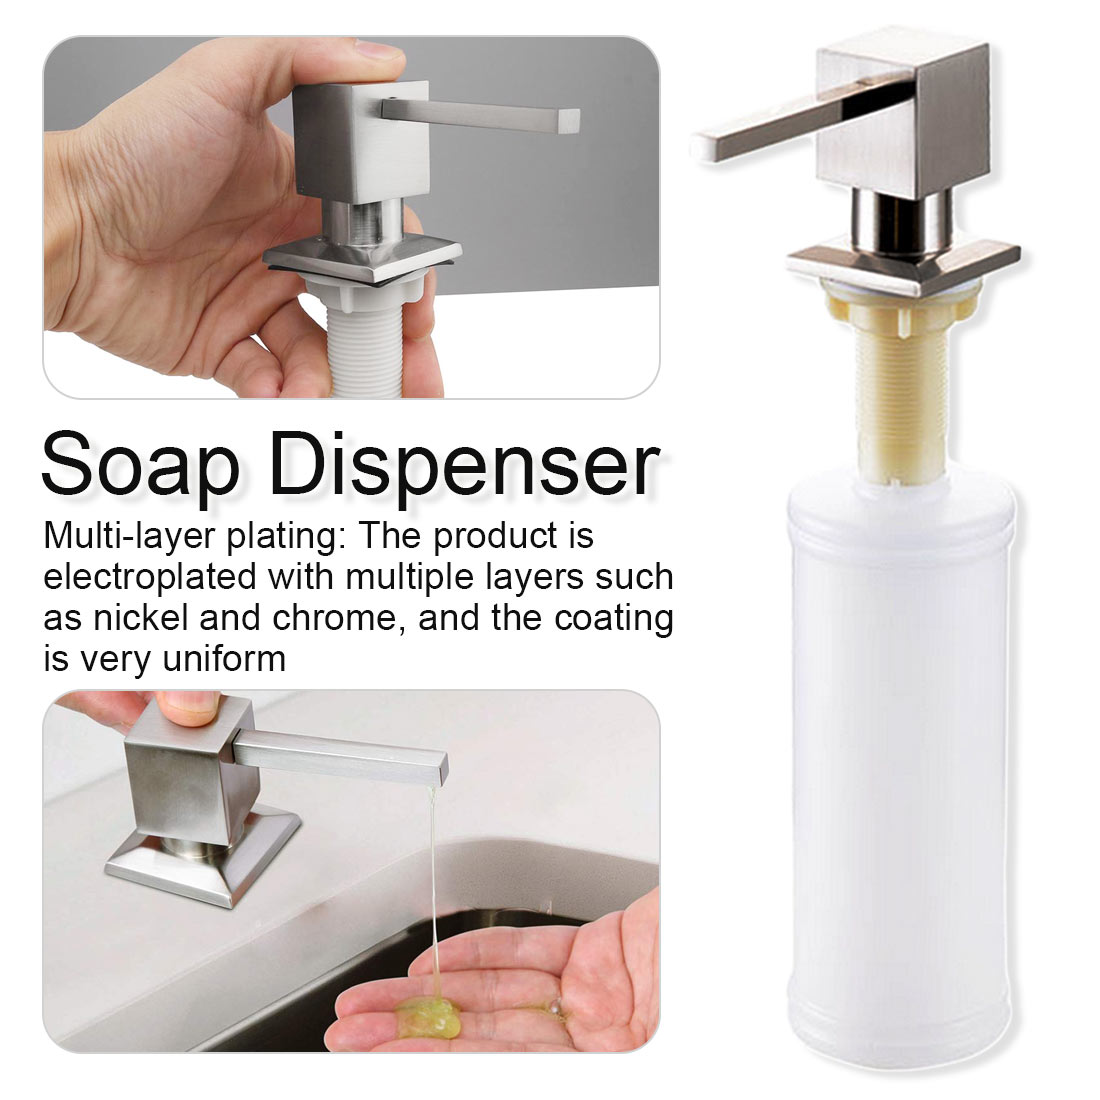 300ML Stainless Steel Liquid Soap Dispenser Deck Mounted Kitchen Soap Dispensers Built in Square Soap Dispenser Pump